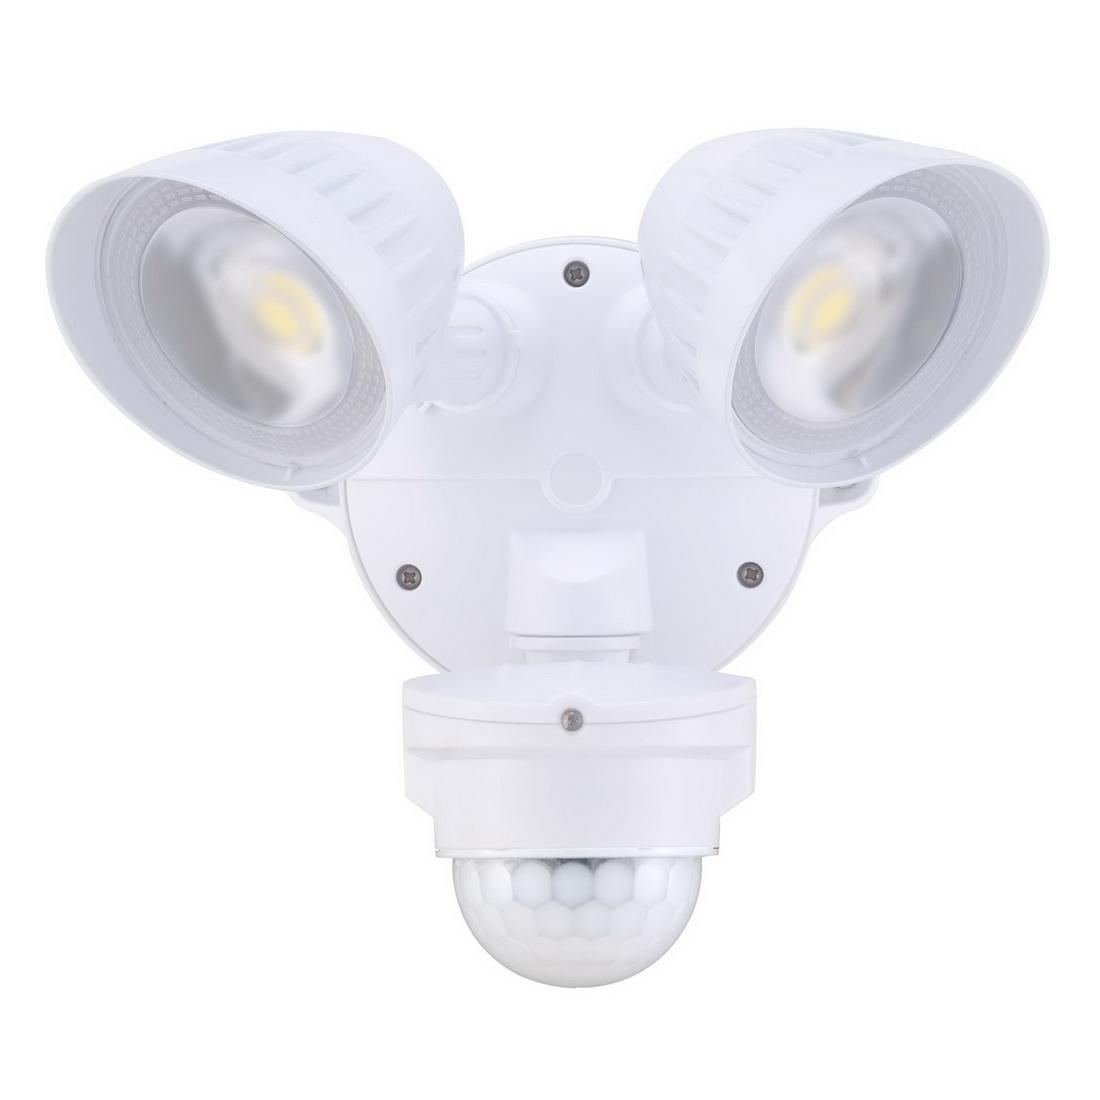 2x20W 100-240V 4000lm 5000K Twin LED Spotlight with Motion Sensor White IP54